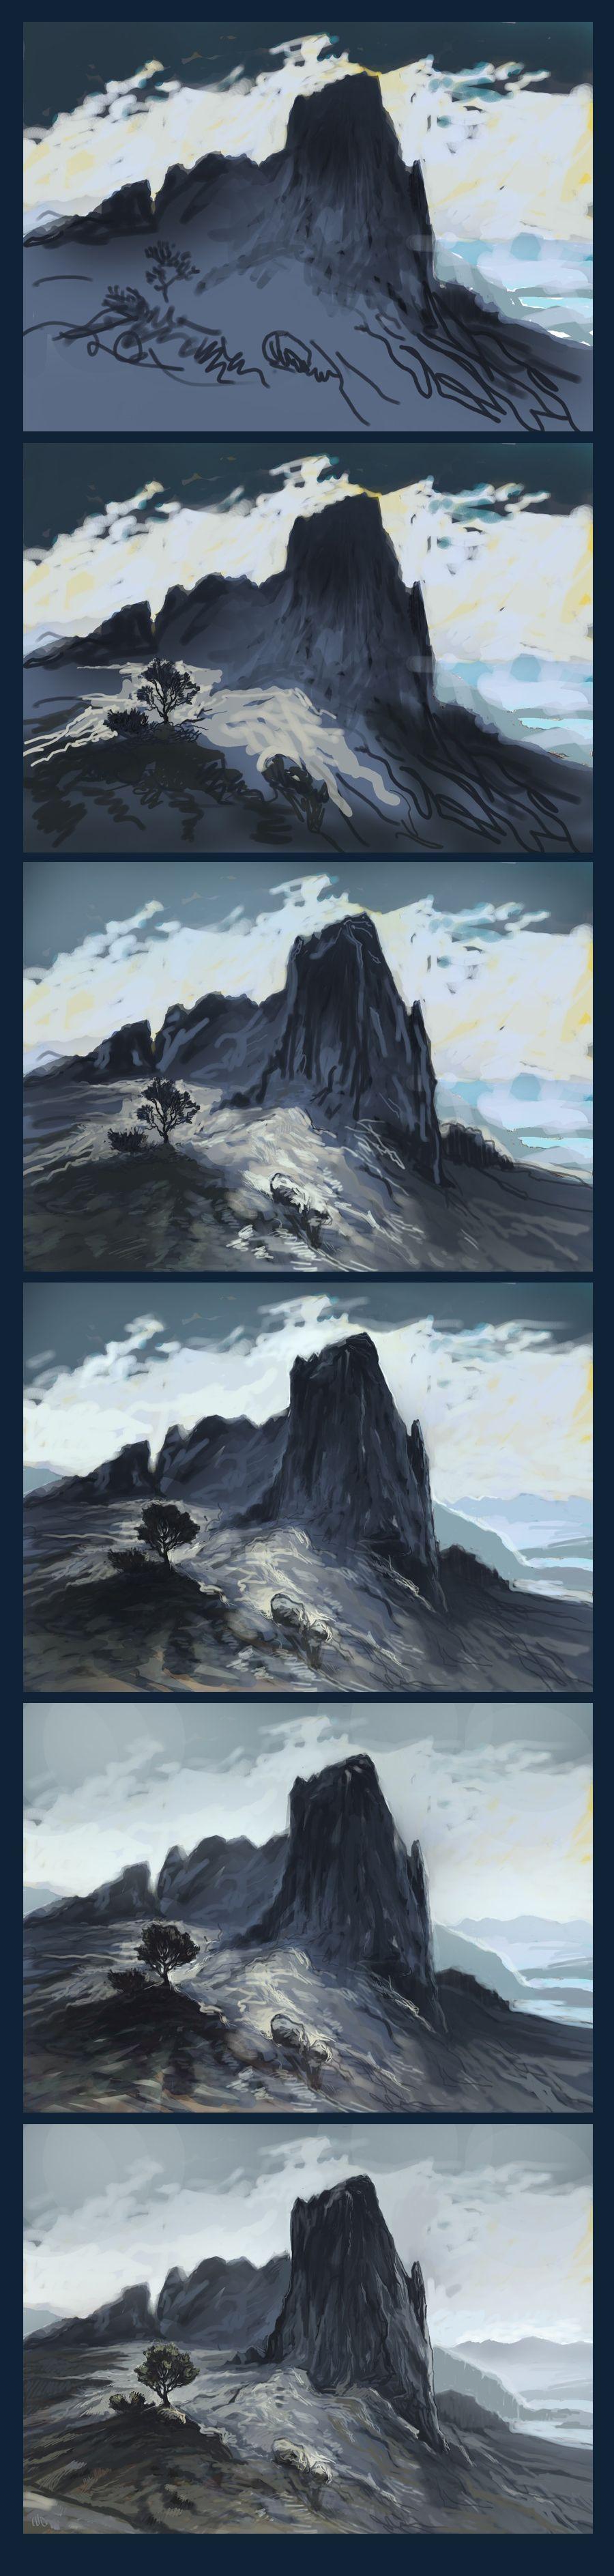 Aaalandscapetutorial3bykresbickyg 9003774 digital art aaa landscape tutorial 3 by kresbicky baditri Images